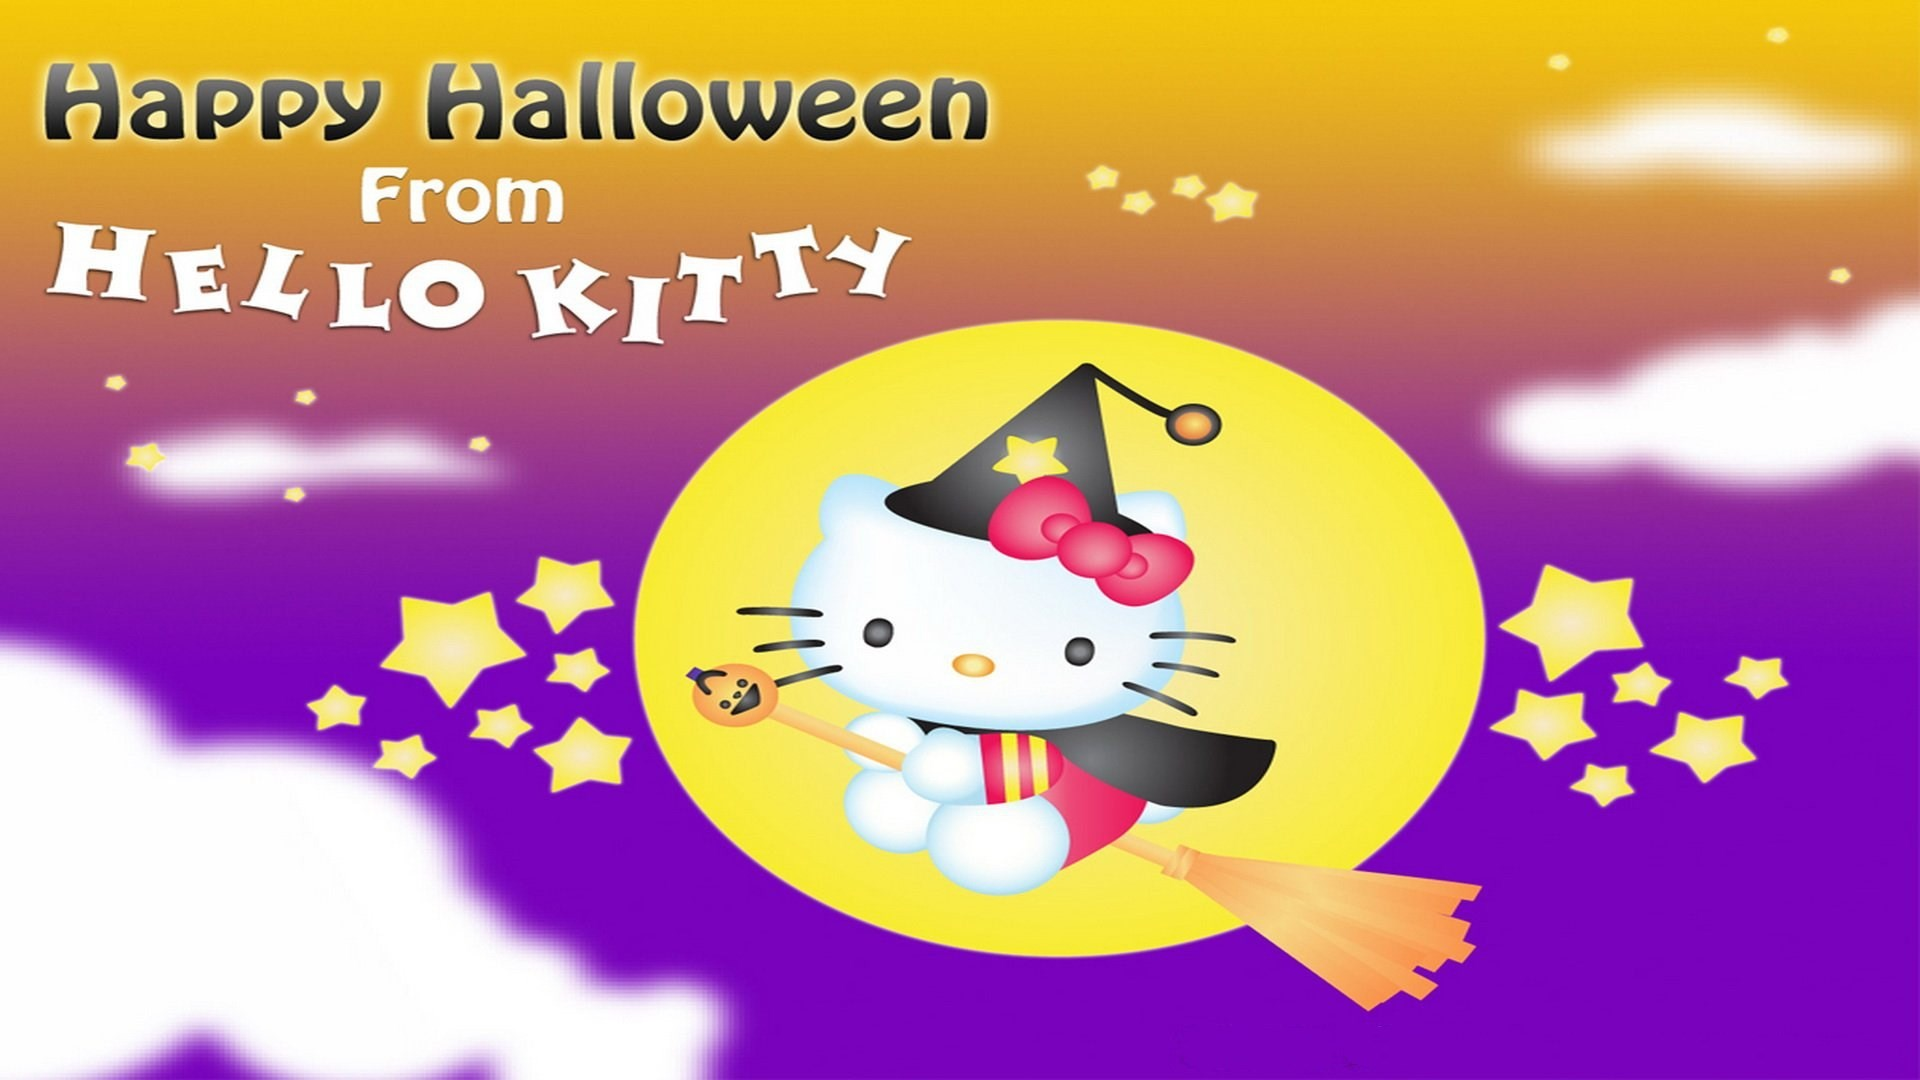 Top Wallpaper Hello Kitty Holiday - 976905-top-hello-kitty-halloween-wallpaper-1920x1080  Graphic_999178.jpg